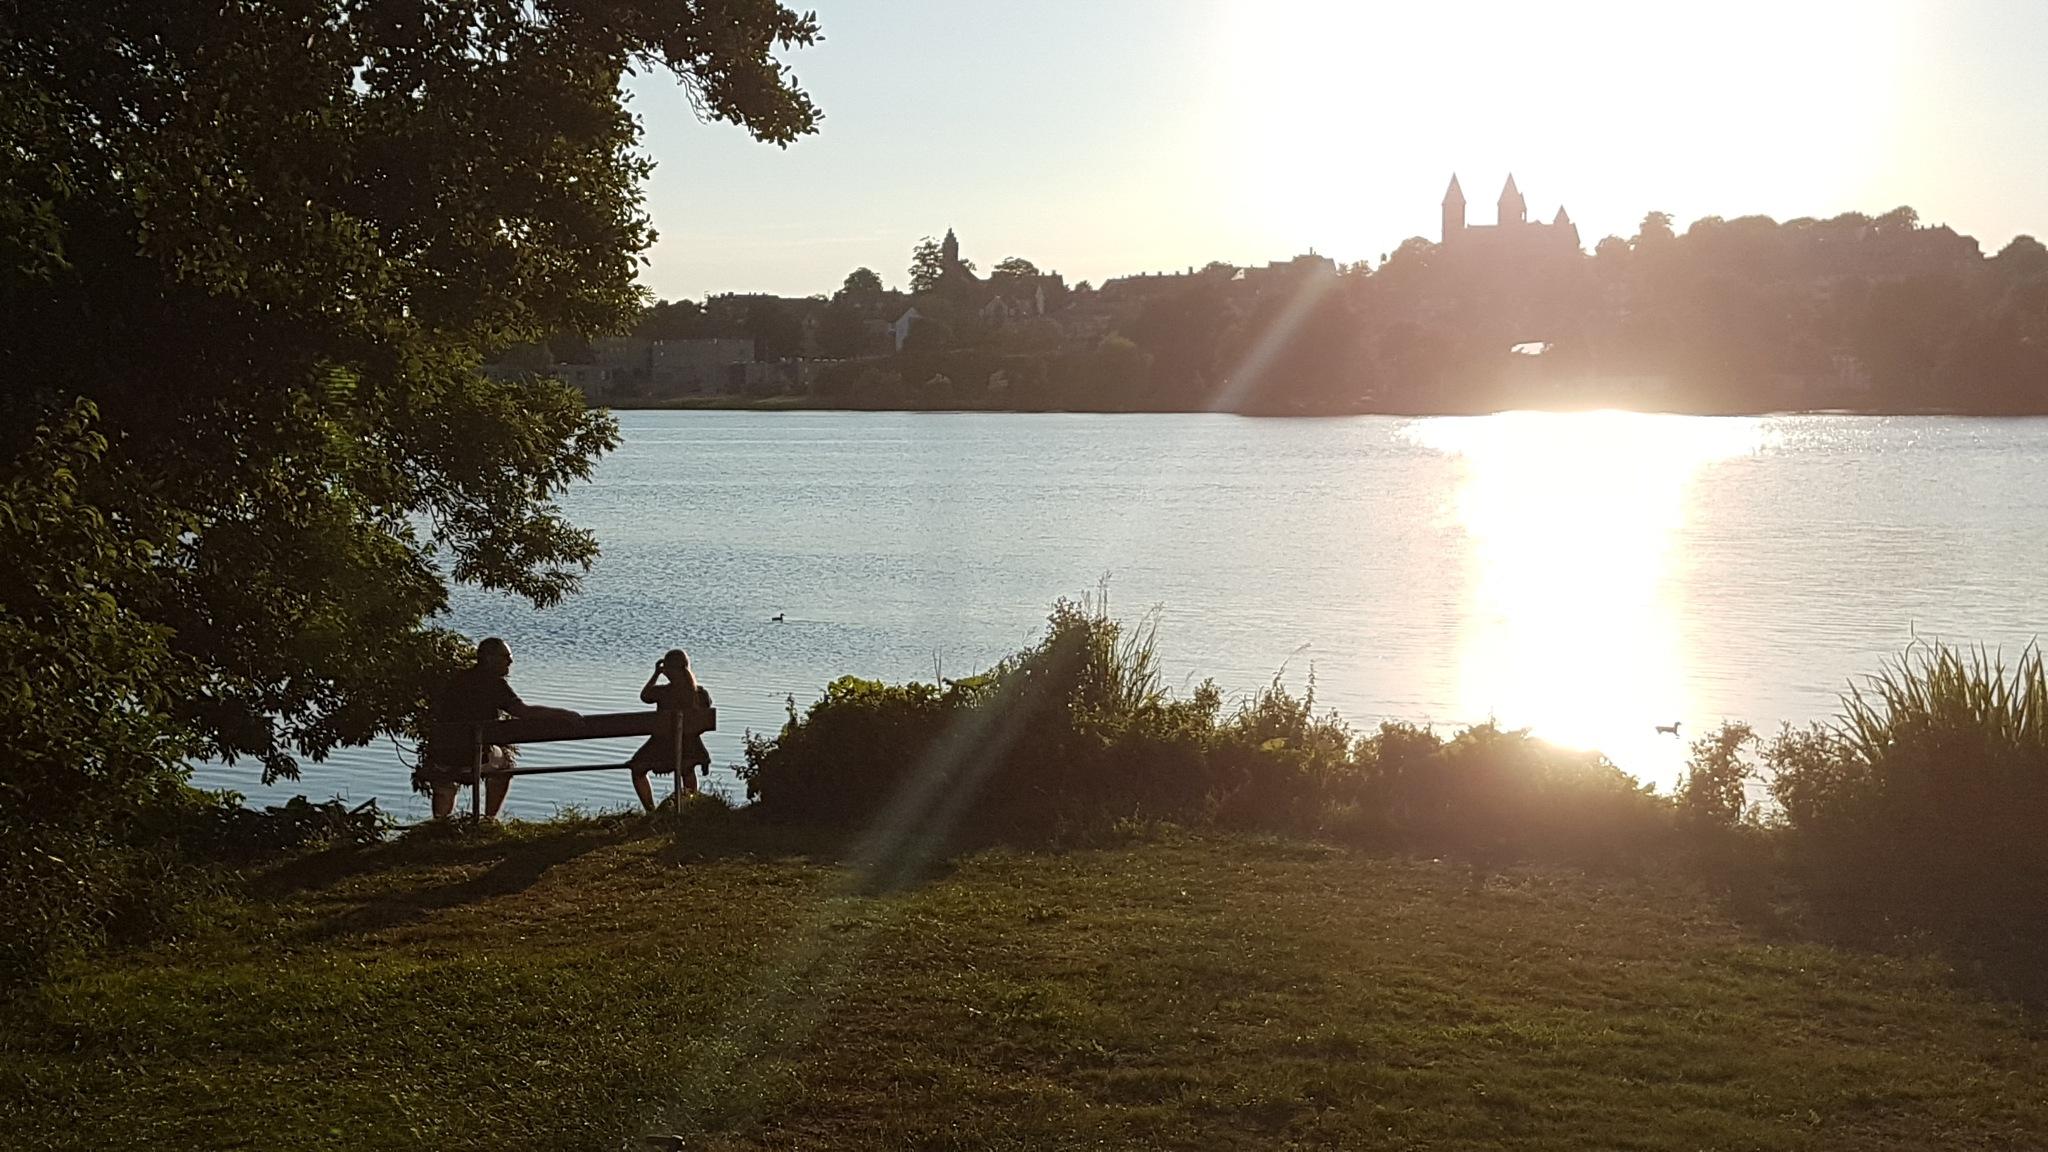 Sunset i Viborg by Luqal Photo